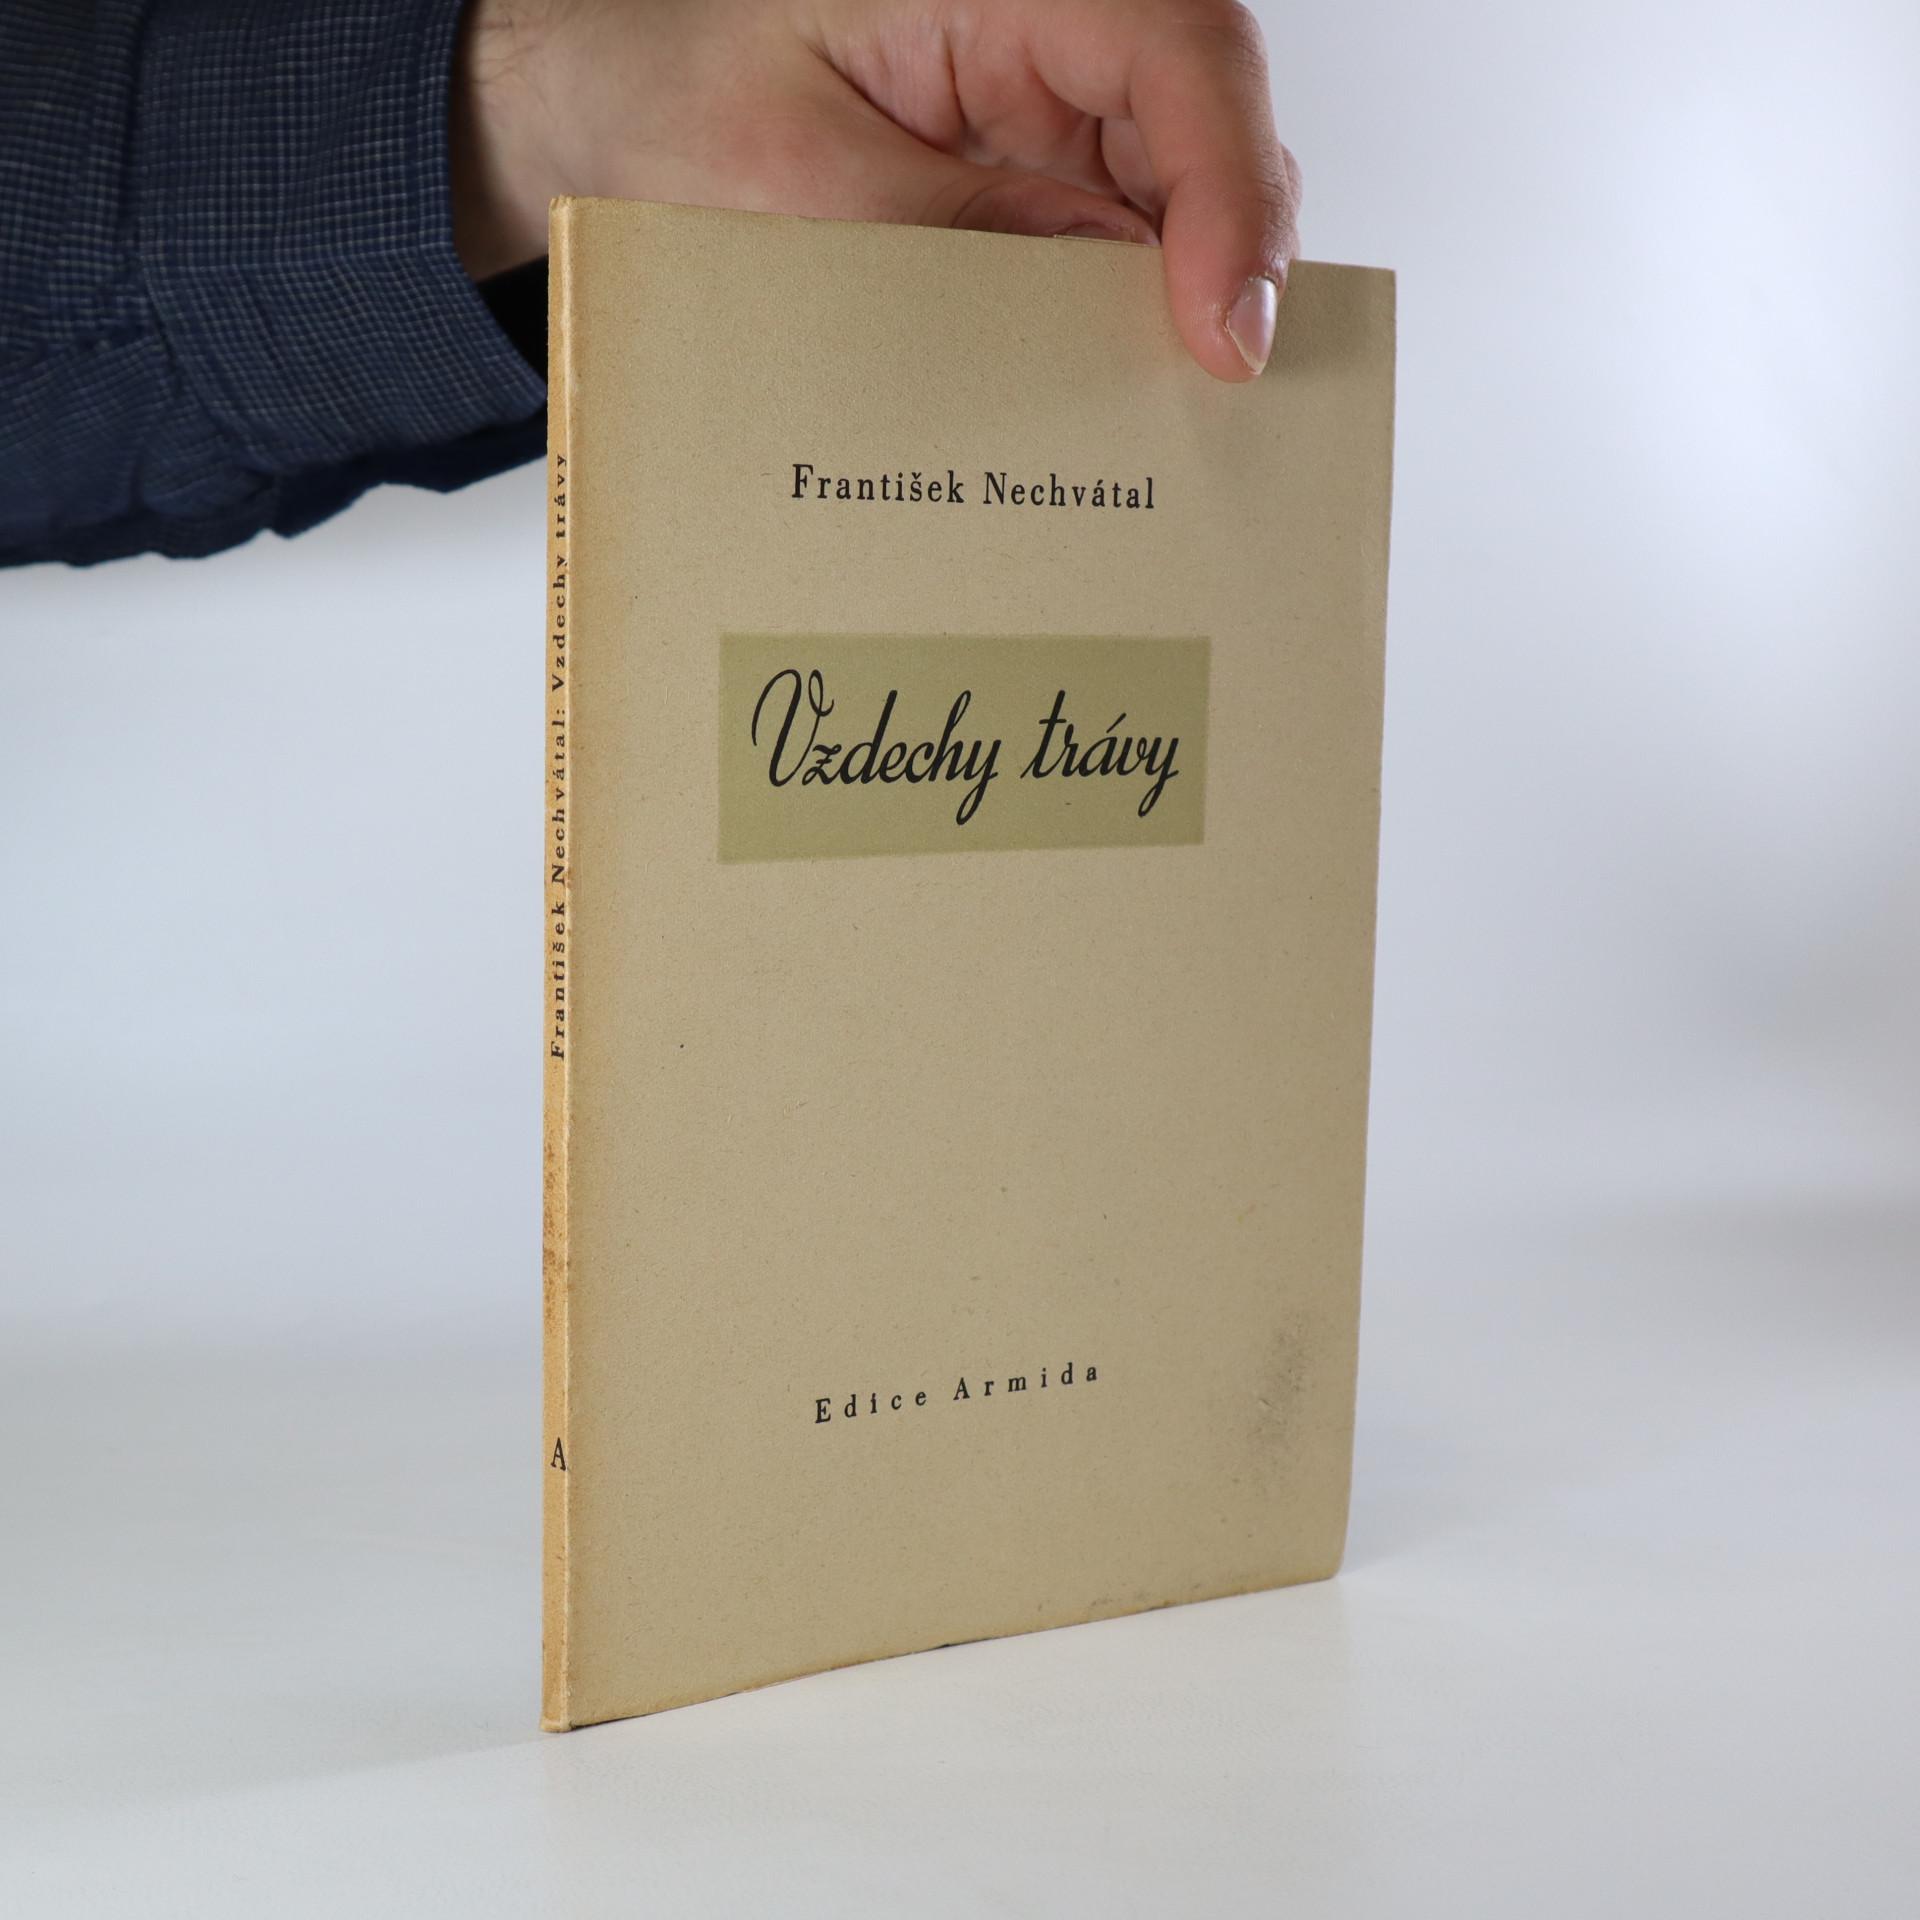 antikvární kniha Vzdechy trávy, 1944